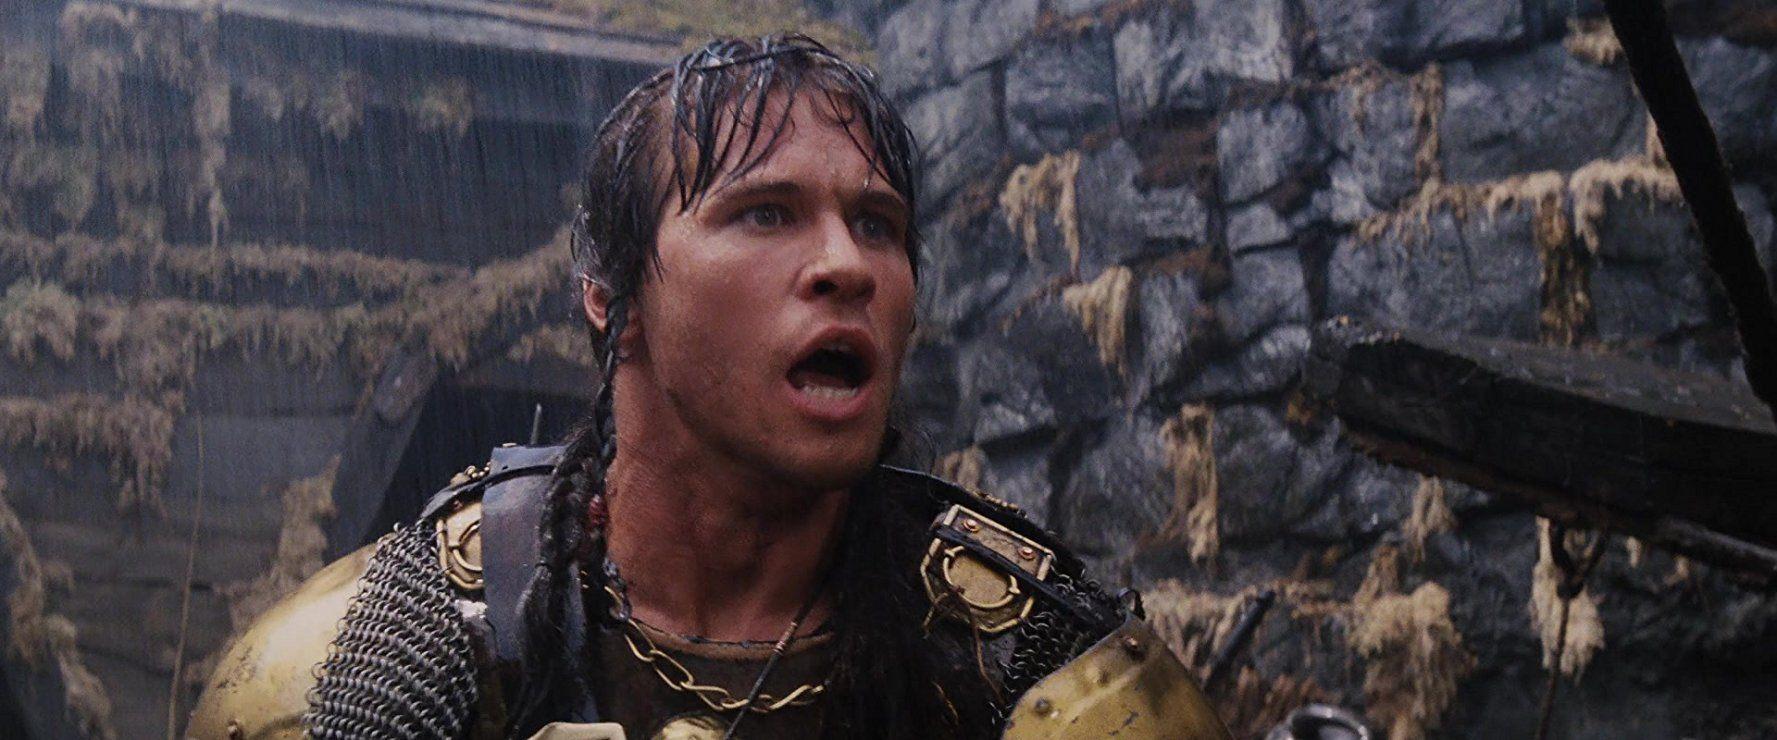 Val Kilmer as Madmartigan in Willow